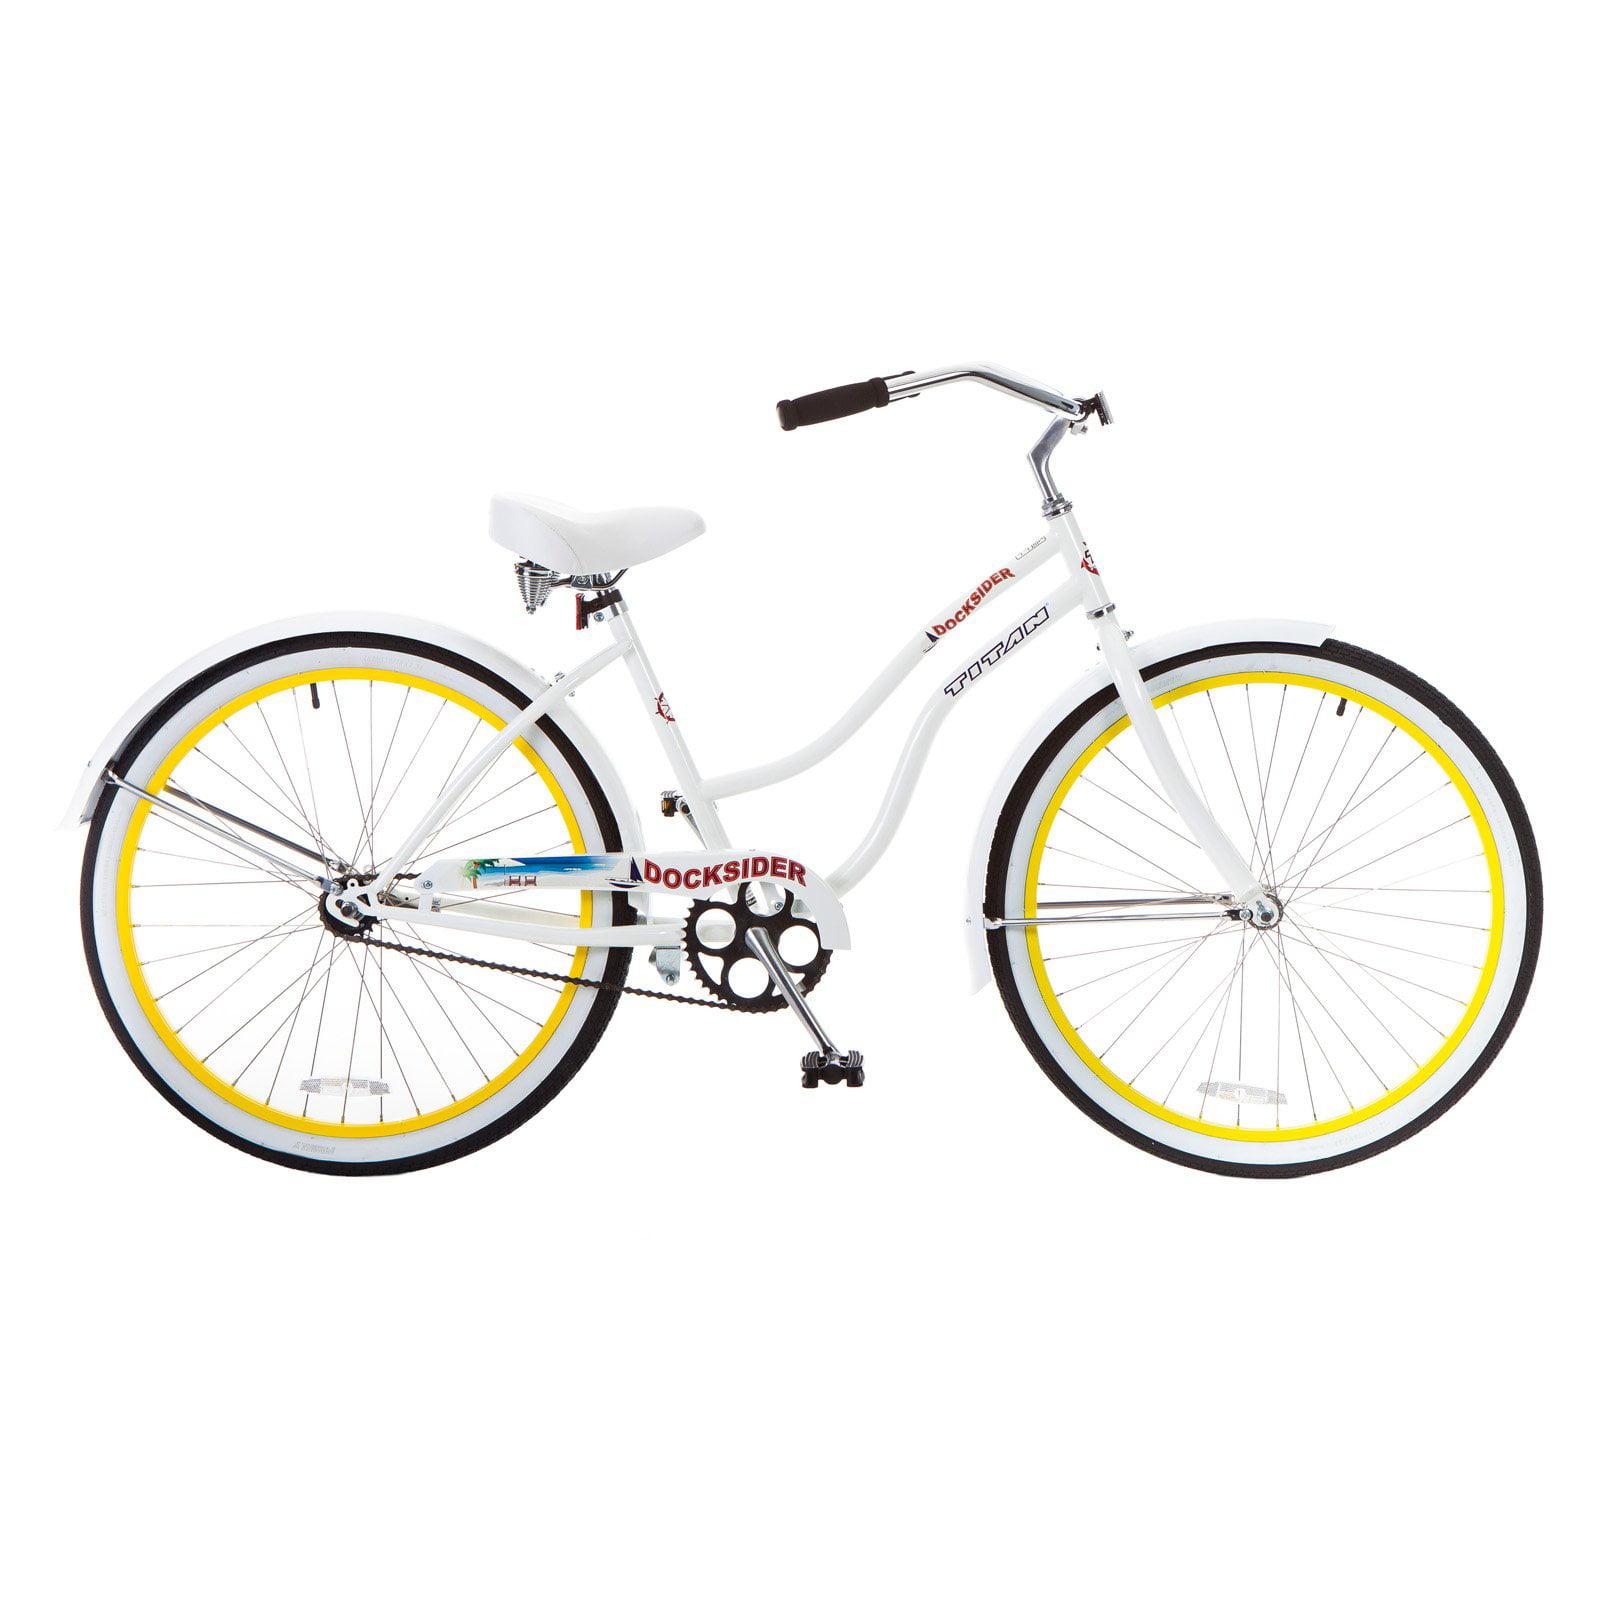 "TITAN Docksider Women's Beach Cruiser Single-Speed Bicycle, 17"" Frame, 26"" Wheels, Yellow Wheels"